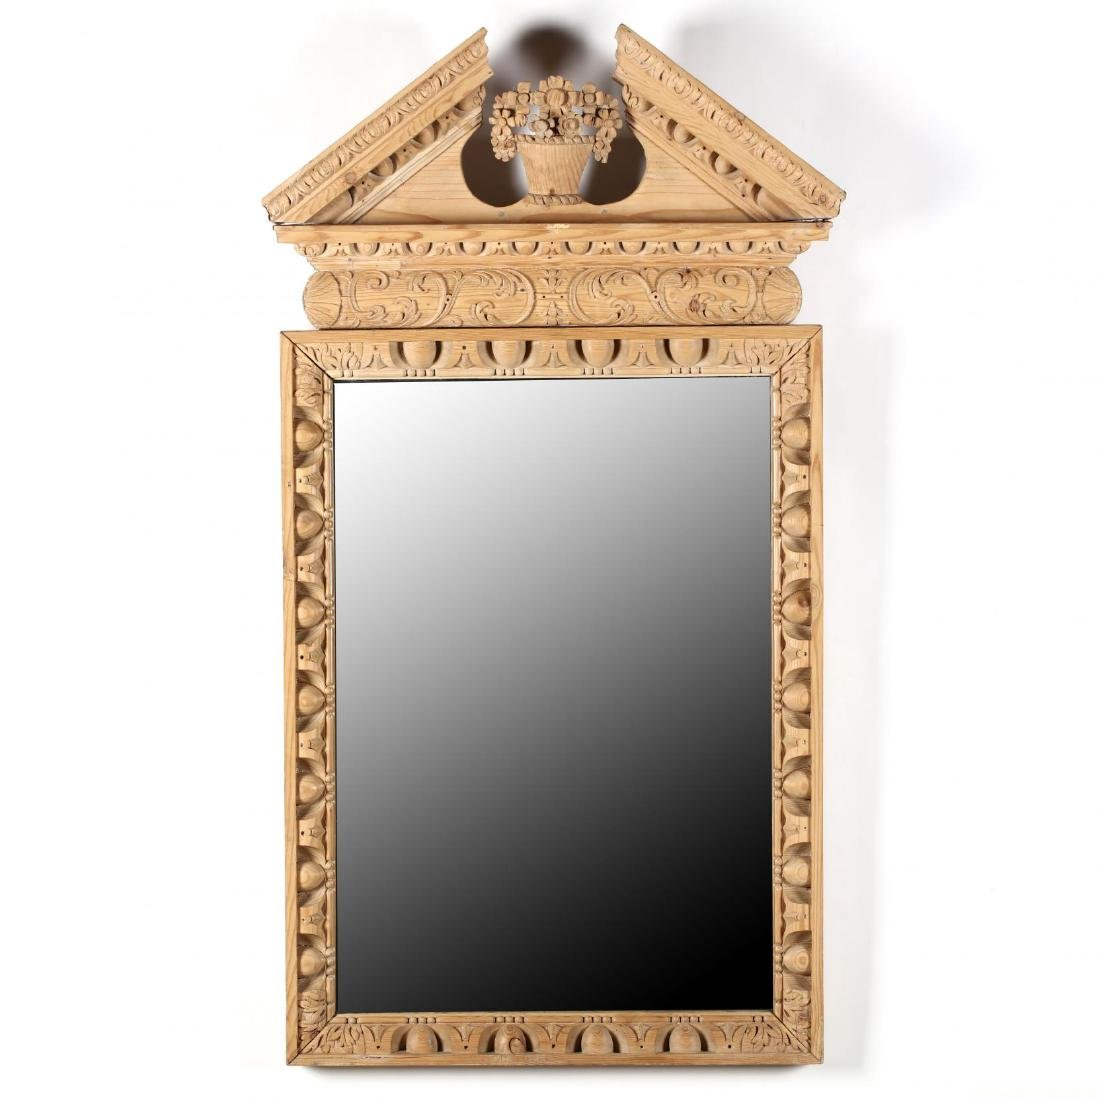 Italianate Carved Pine Architectural Mirror